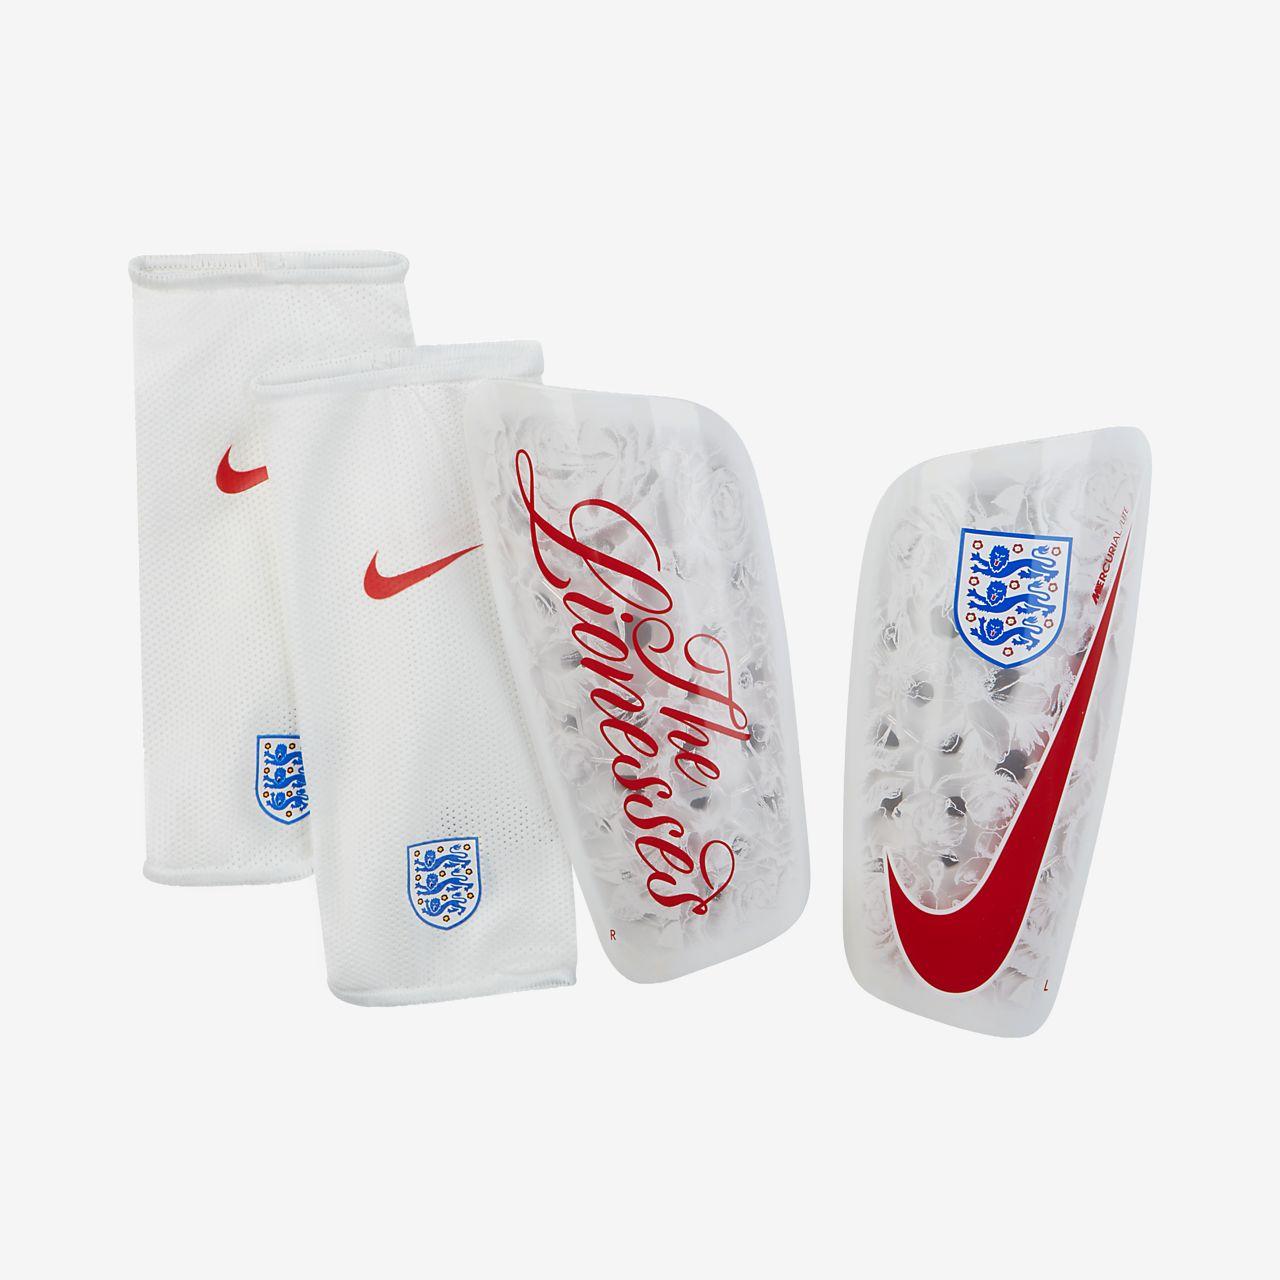 England Mercurial Lite-fodboldbenskinner